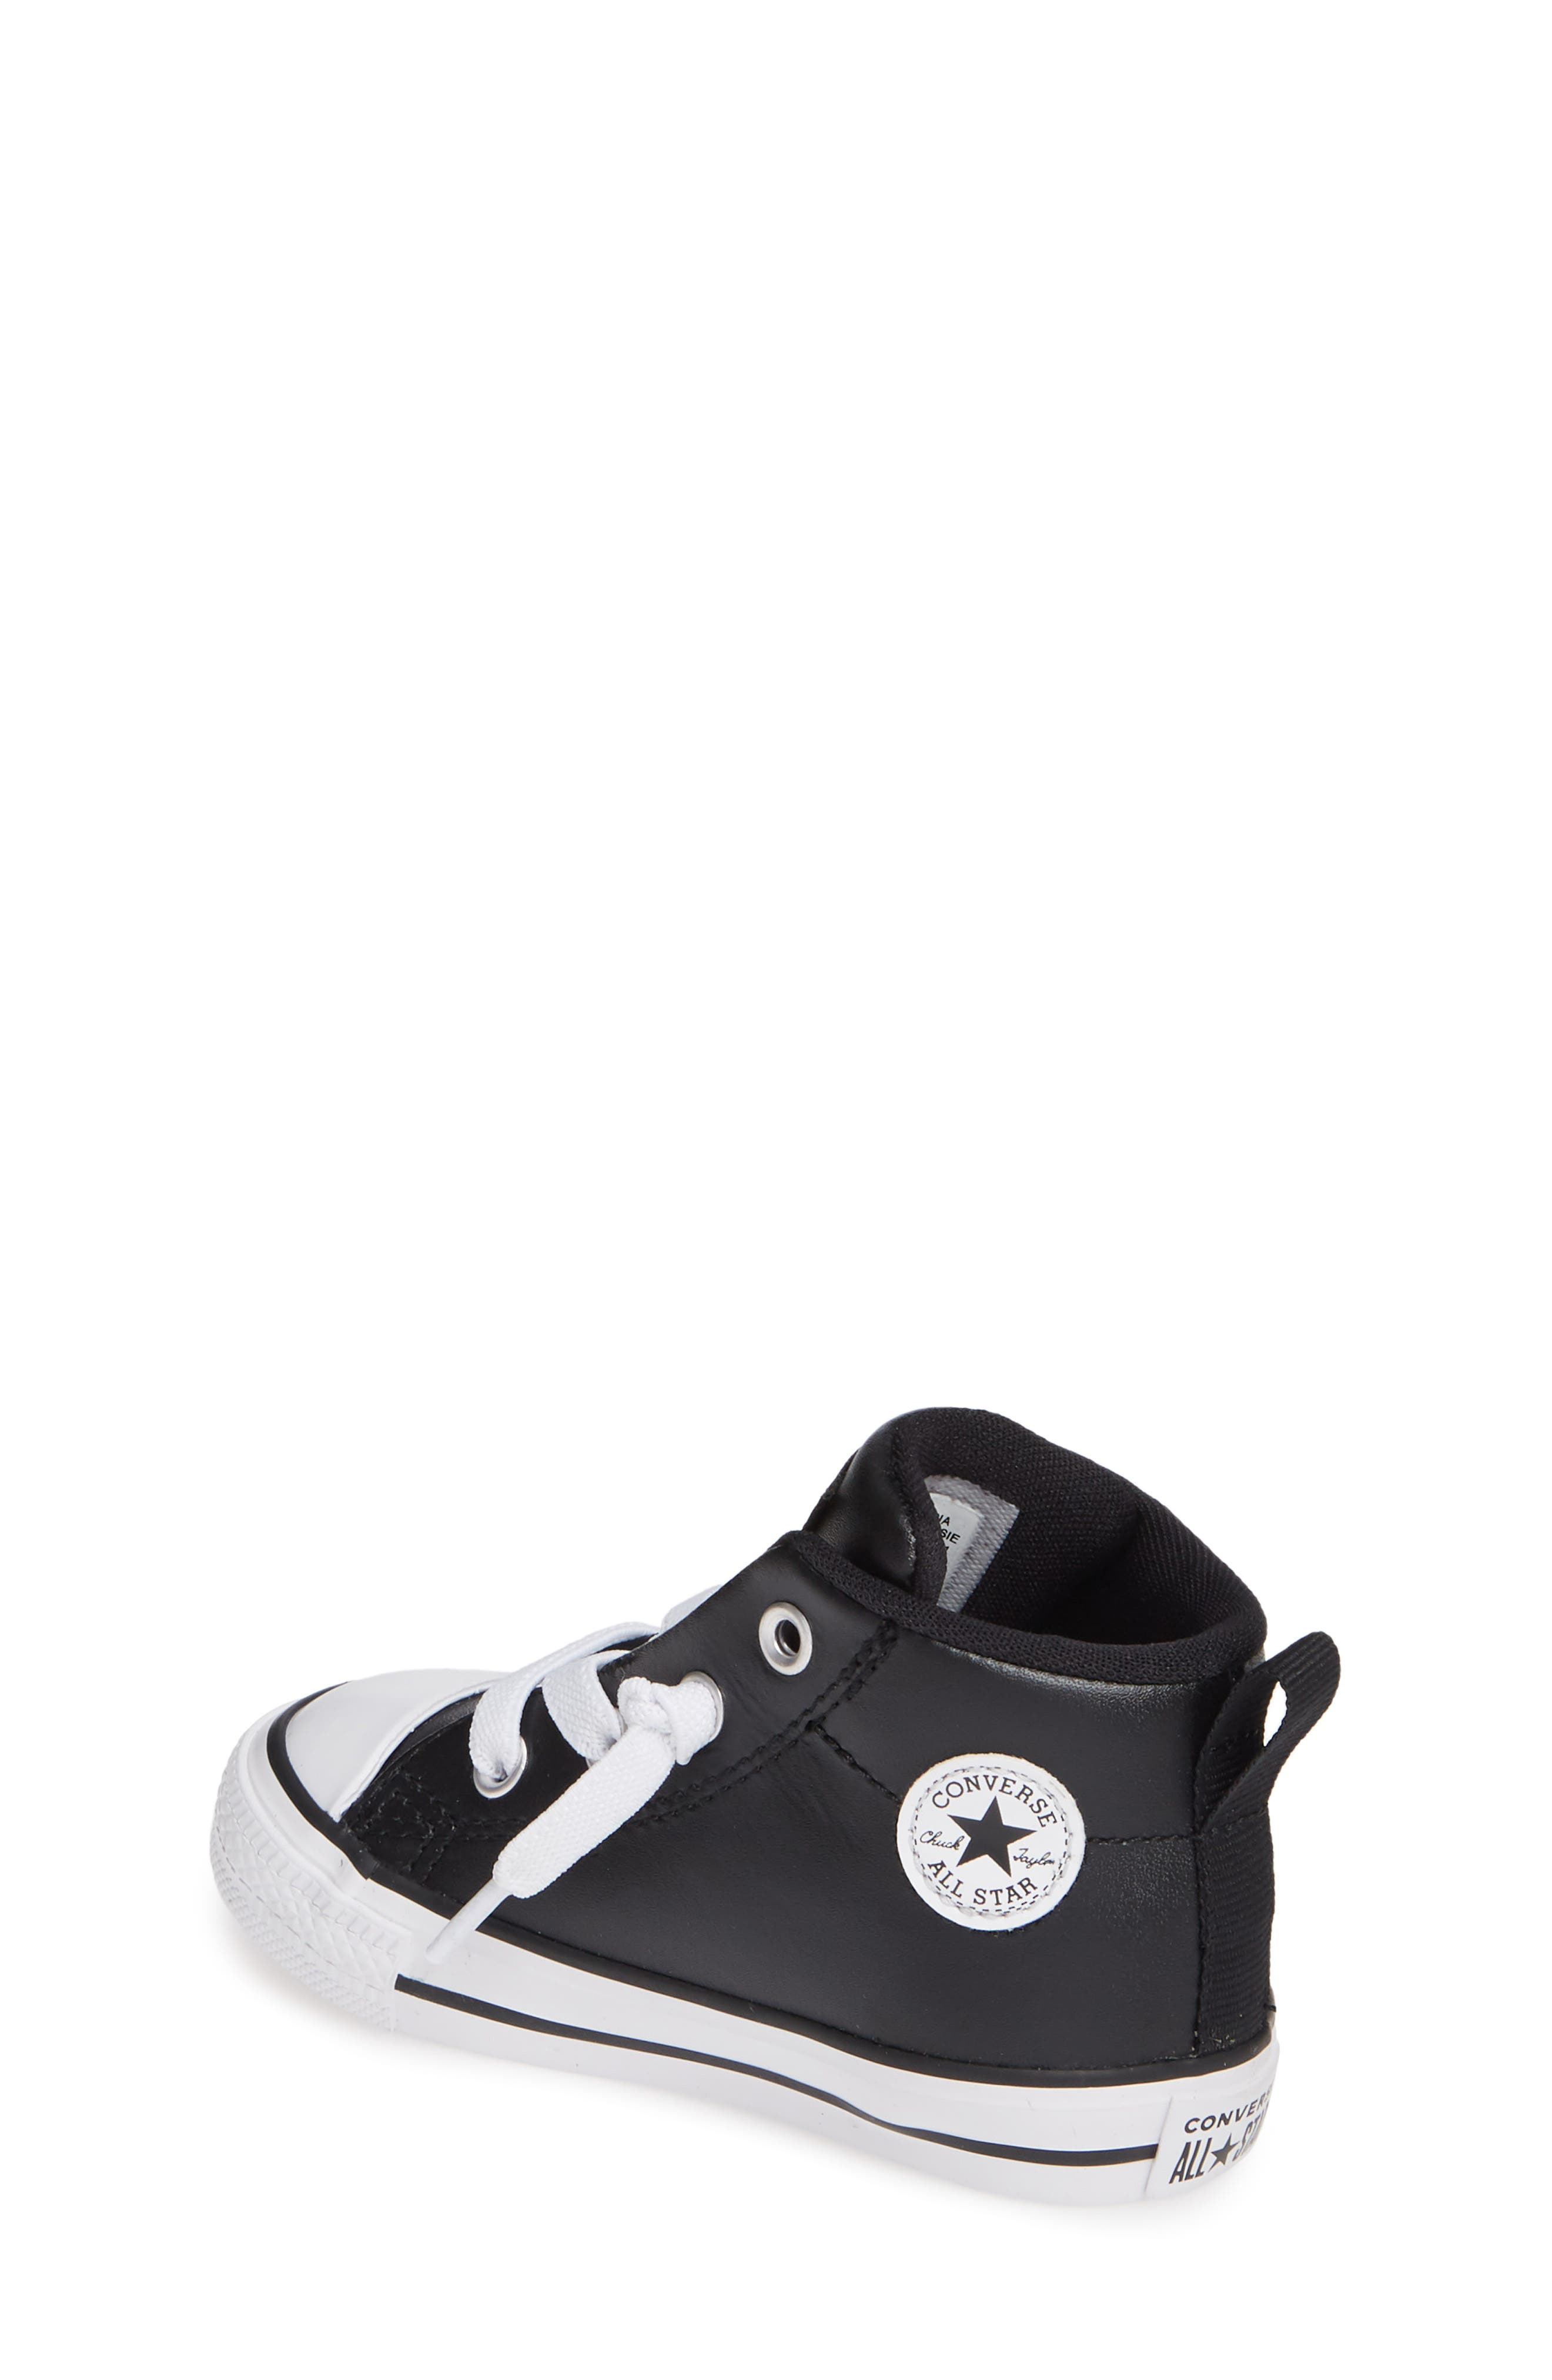 b8b74ca443a Big Girls  Converse Shoes (Sizes 3.5-7)